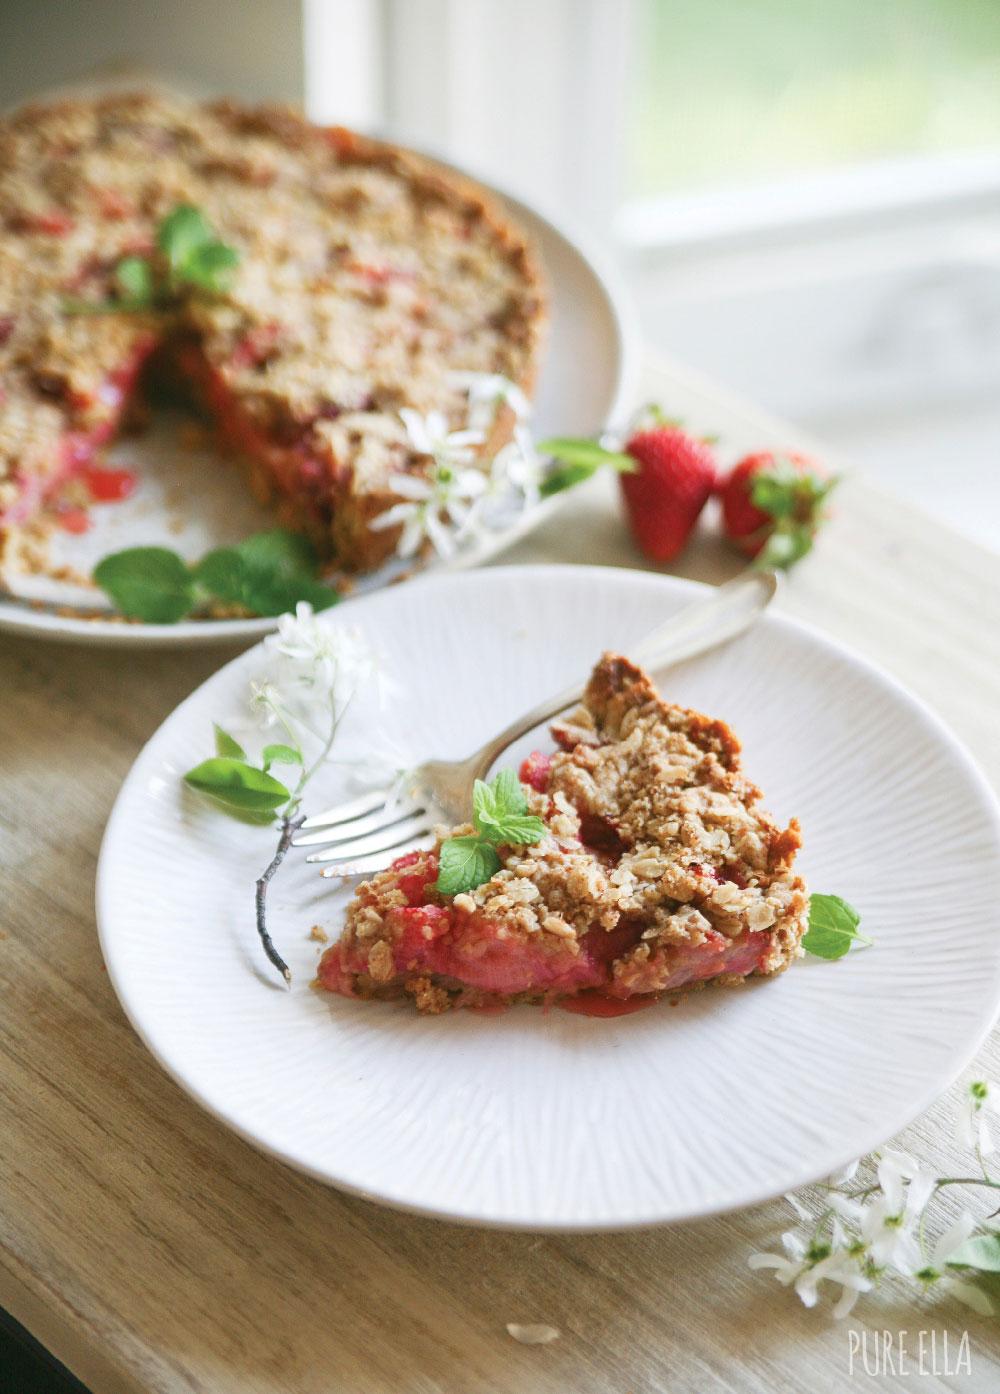 Pure-Ella-Gluten-free-vegan-Strawberry-Rhubarb-Crumble-Pie12